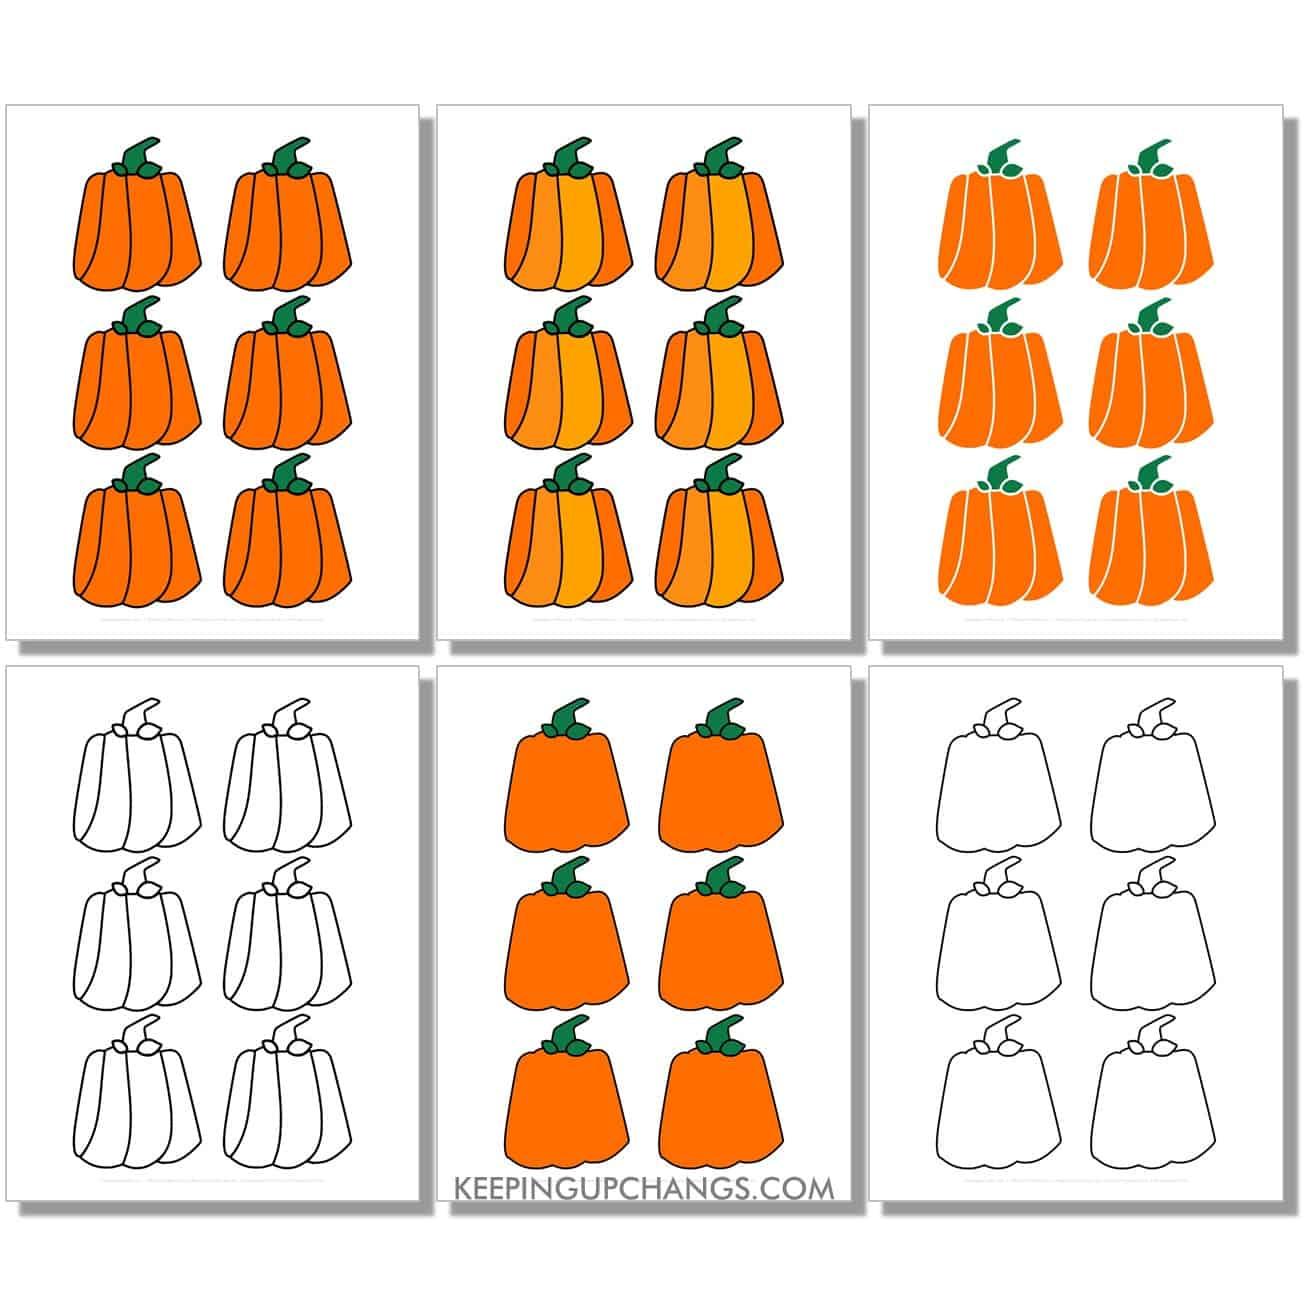 free mini box, square, rectangle pumpkin in color, black and white, silhouette, 6 to a page.